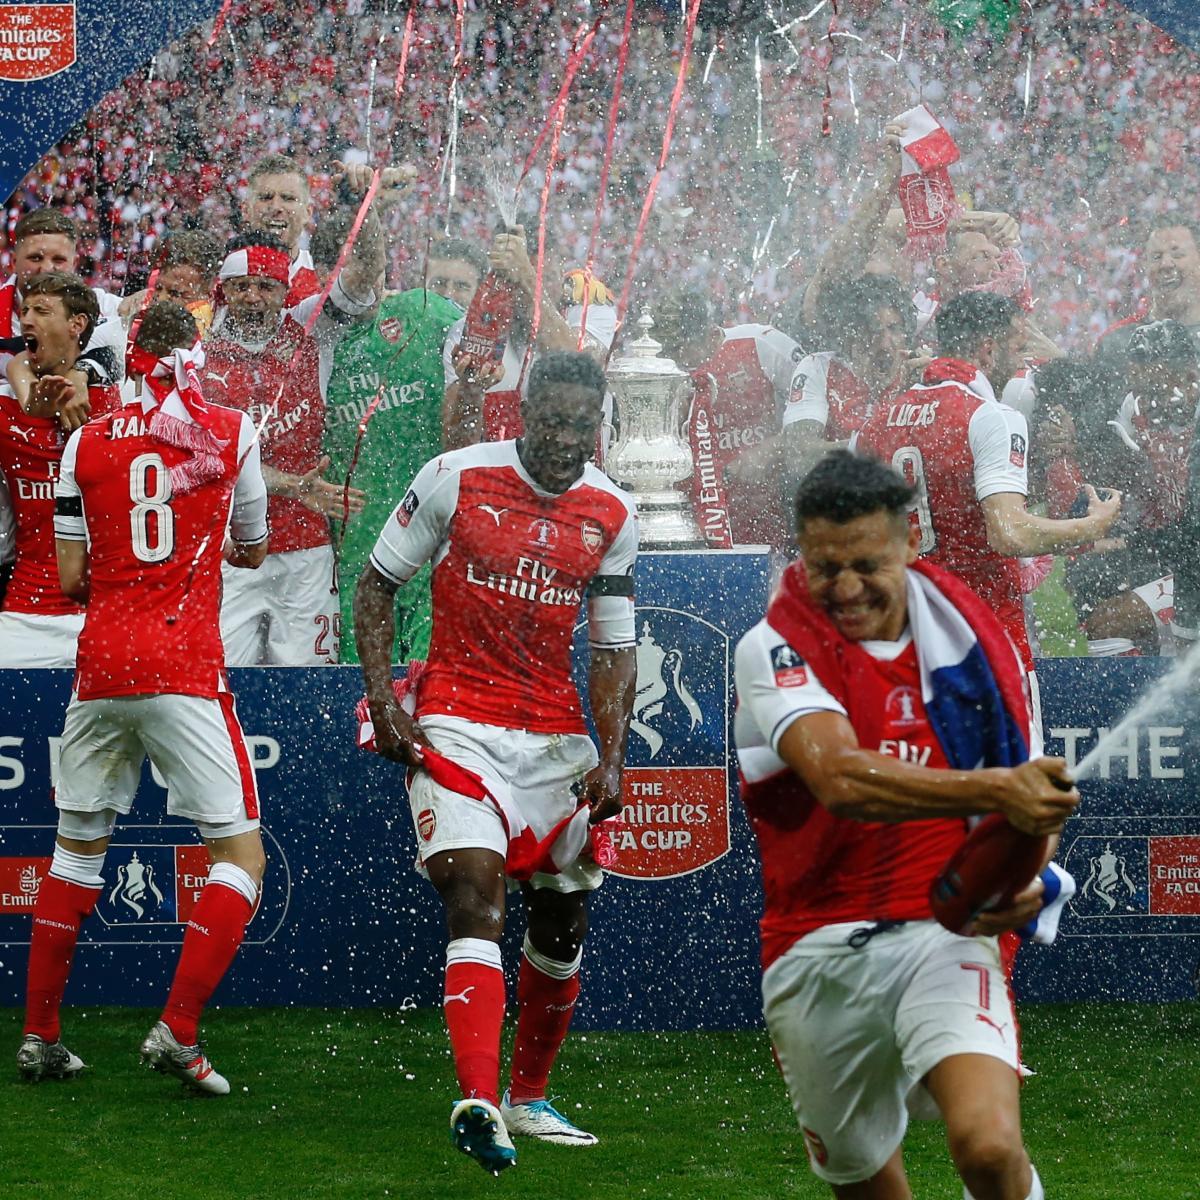 Bastia 0 3 Psg Match Report: European Club Rankings: Arsenal, Dortmund, PSG And